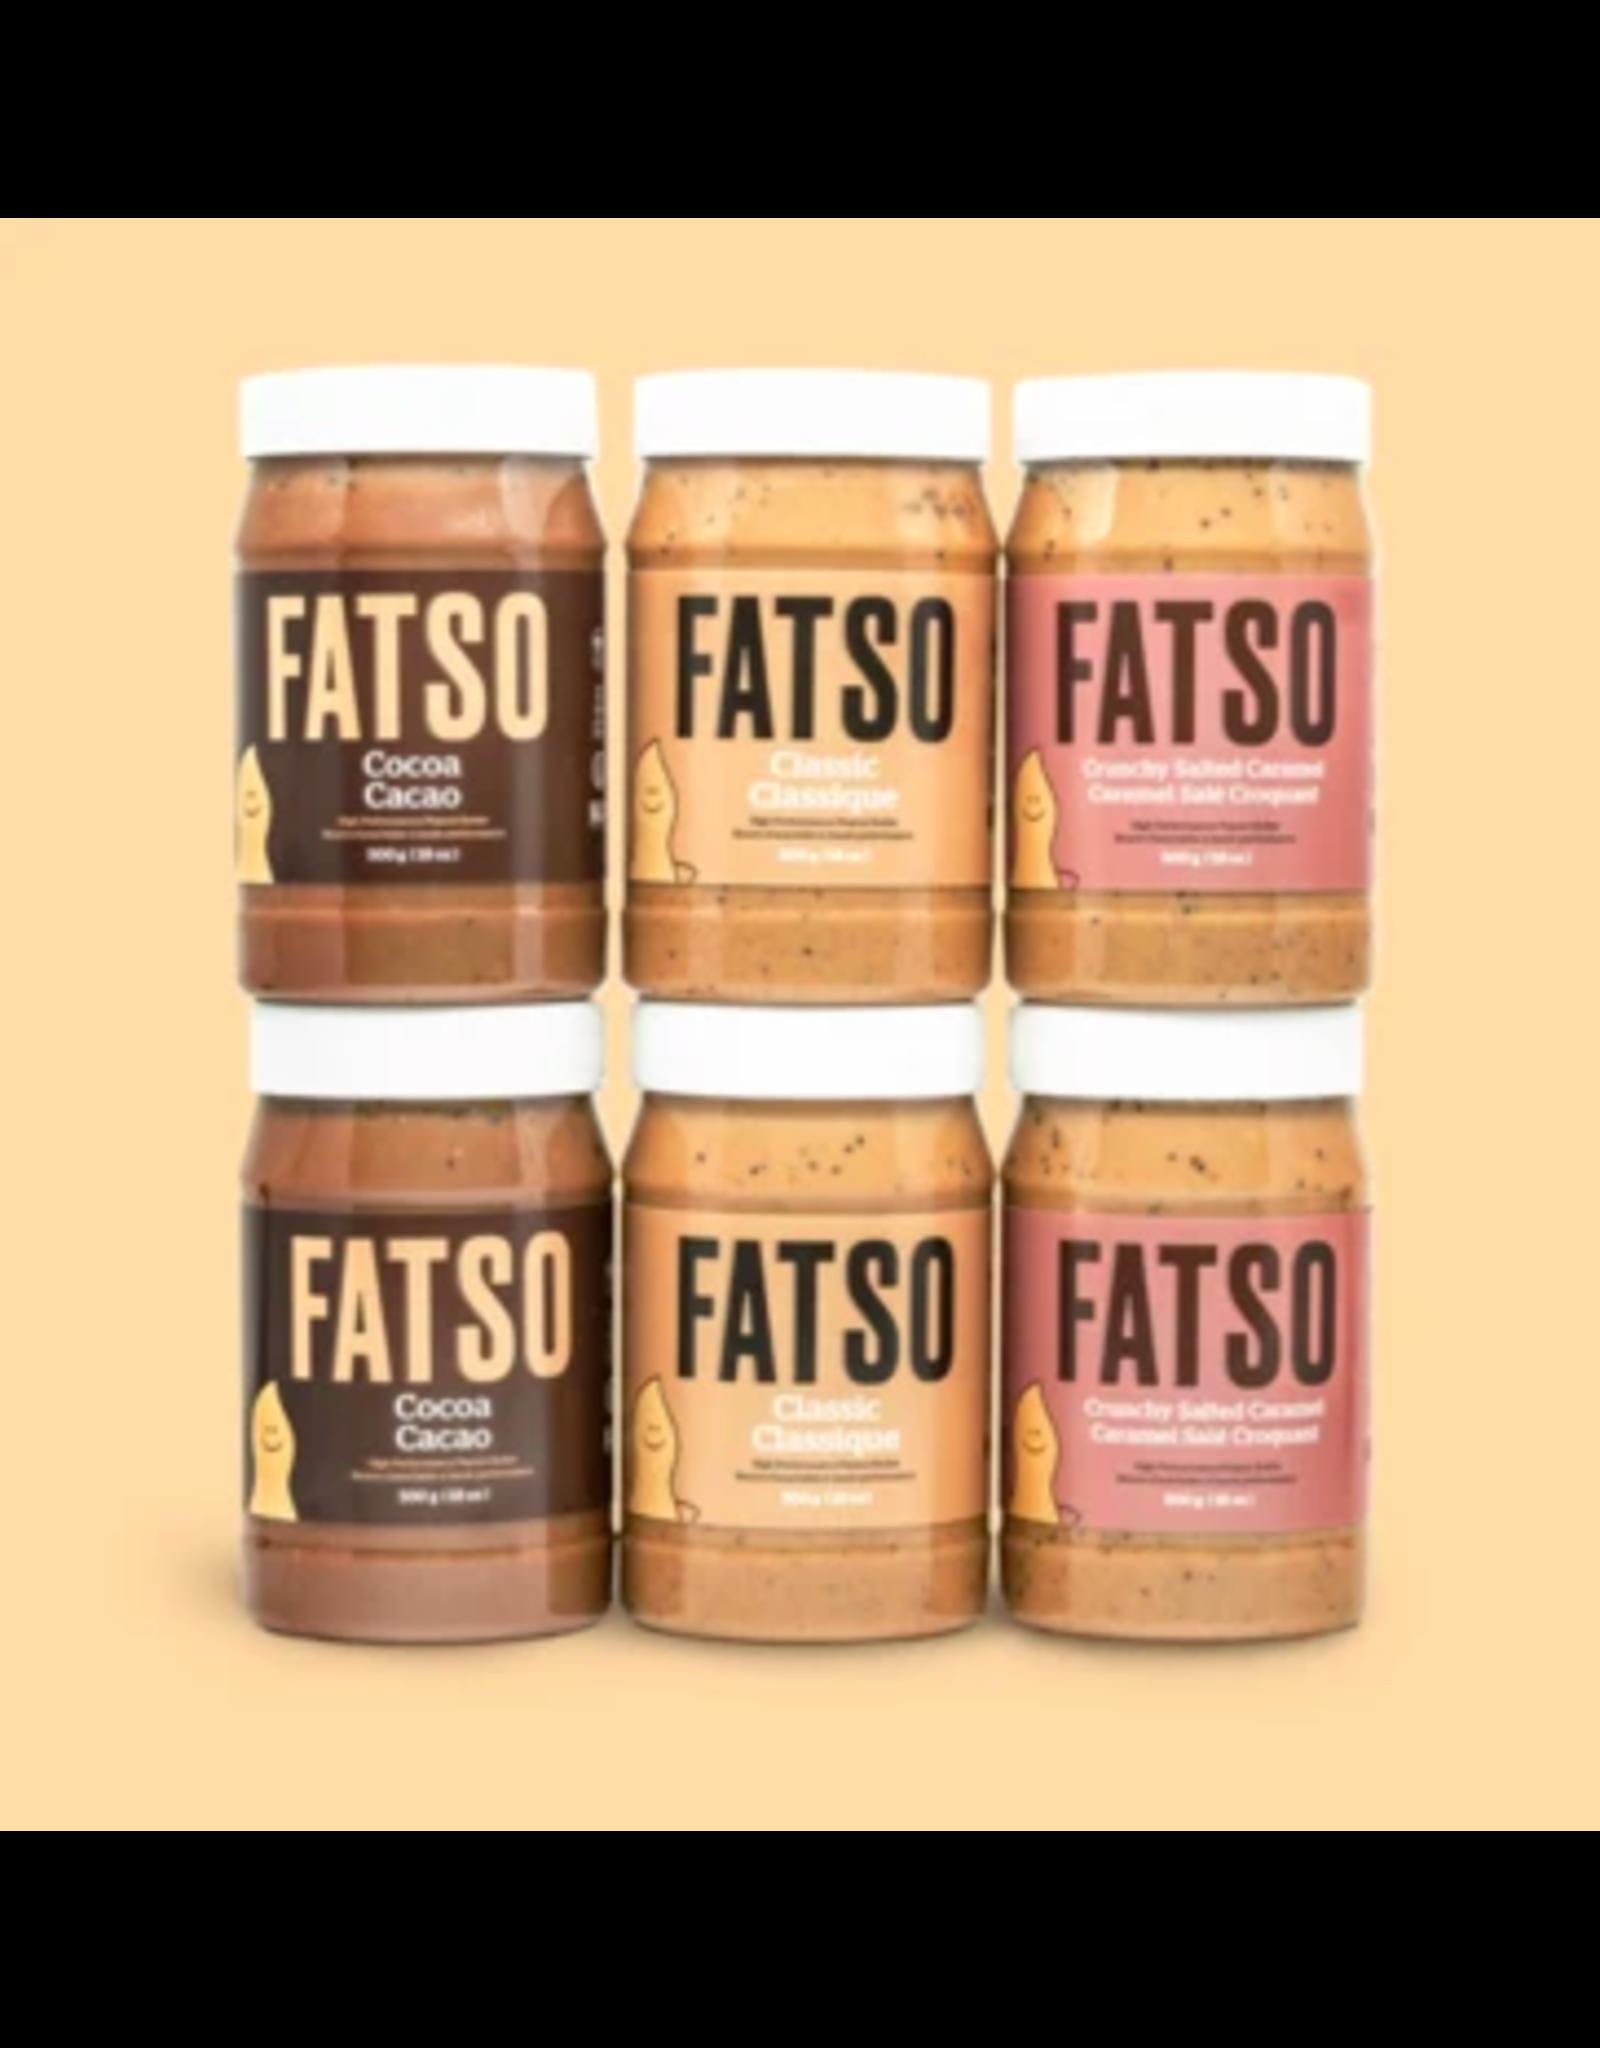 Fatso classic peanut butter